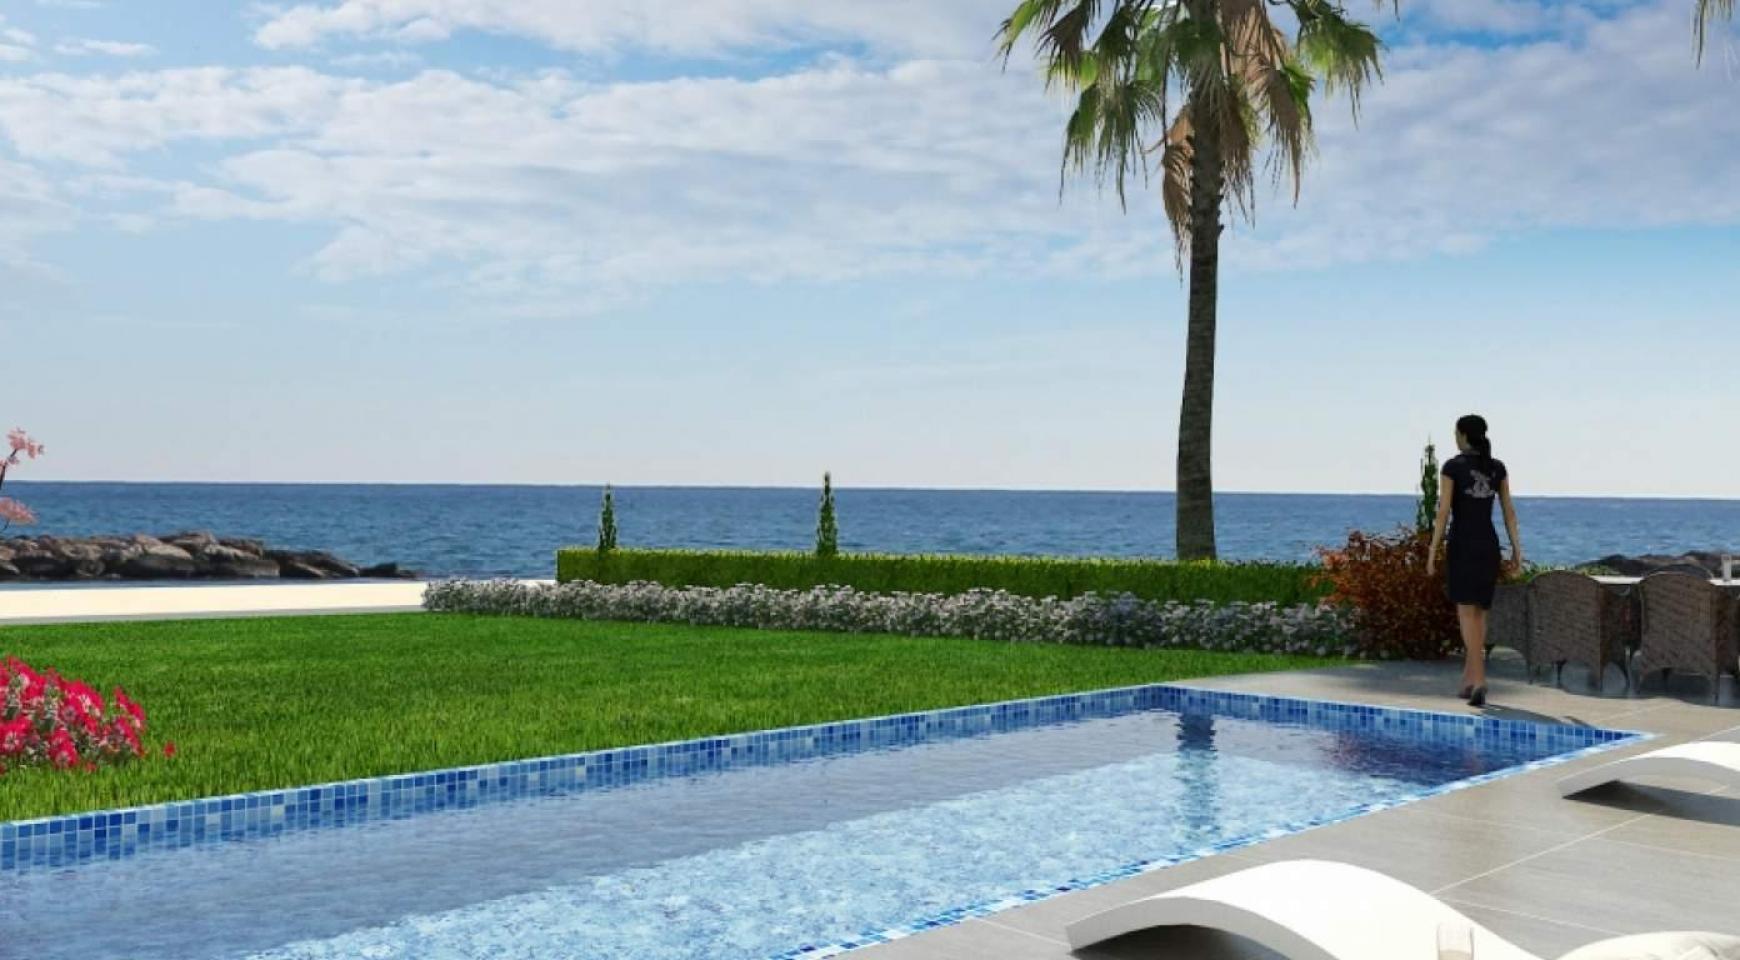 Contemporary Beachfront Villa with 5 Bedrooms - 1